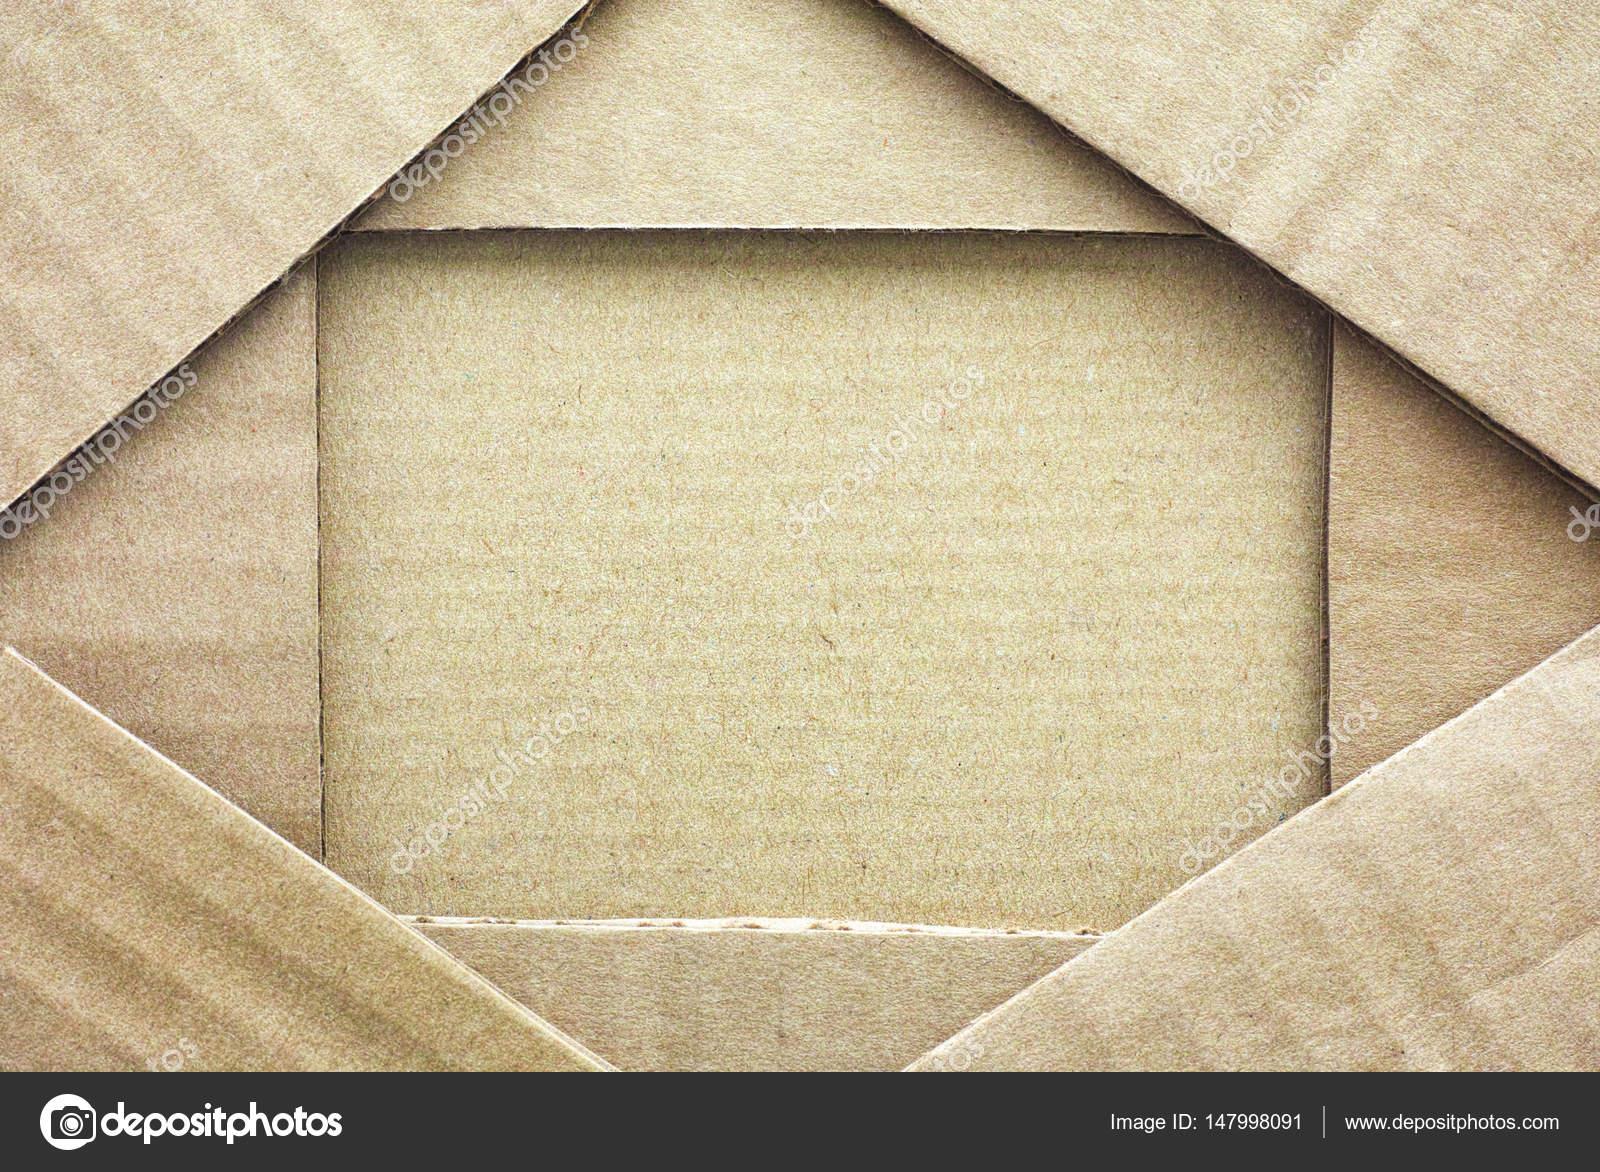 Papprahmen mit Stück Pappe — Stockfoto © Rosinka79 #147998091